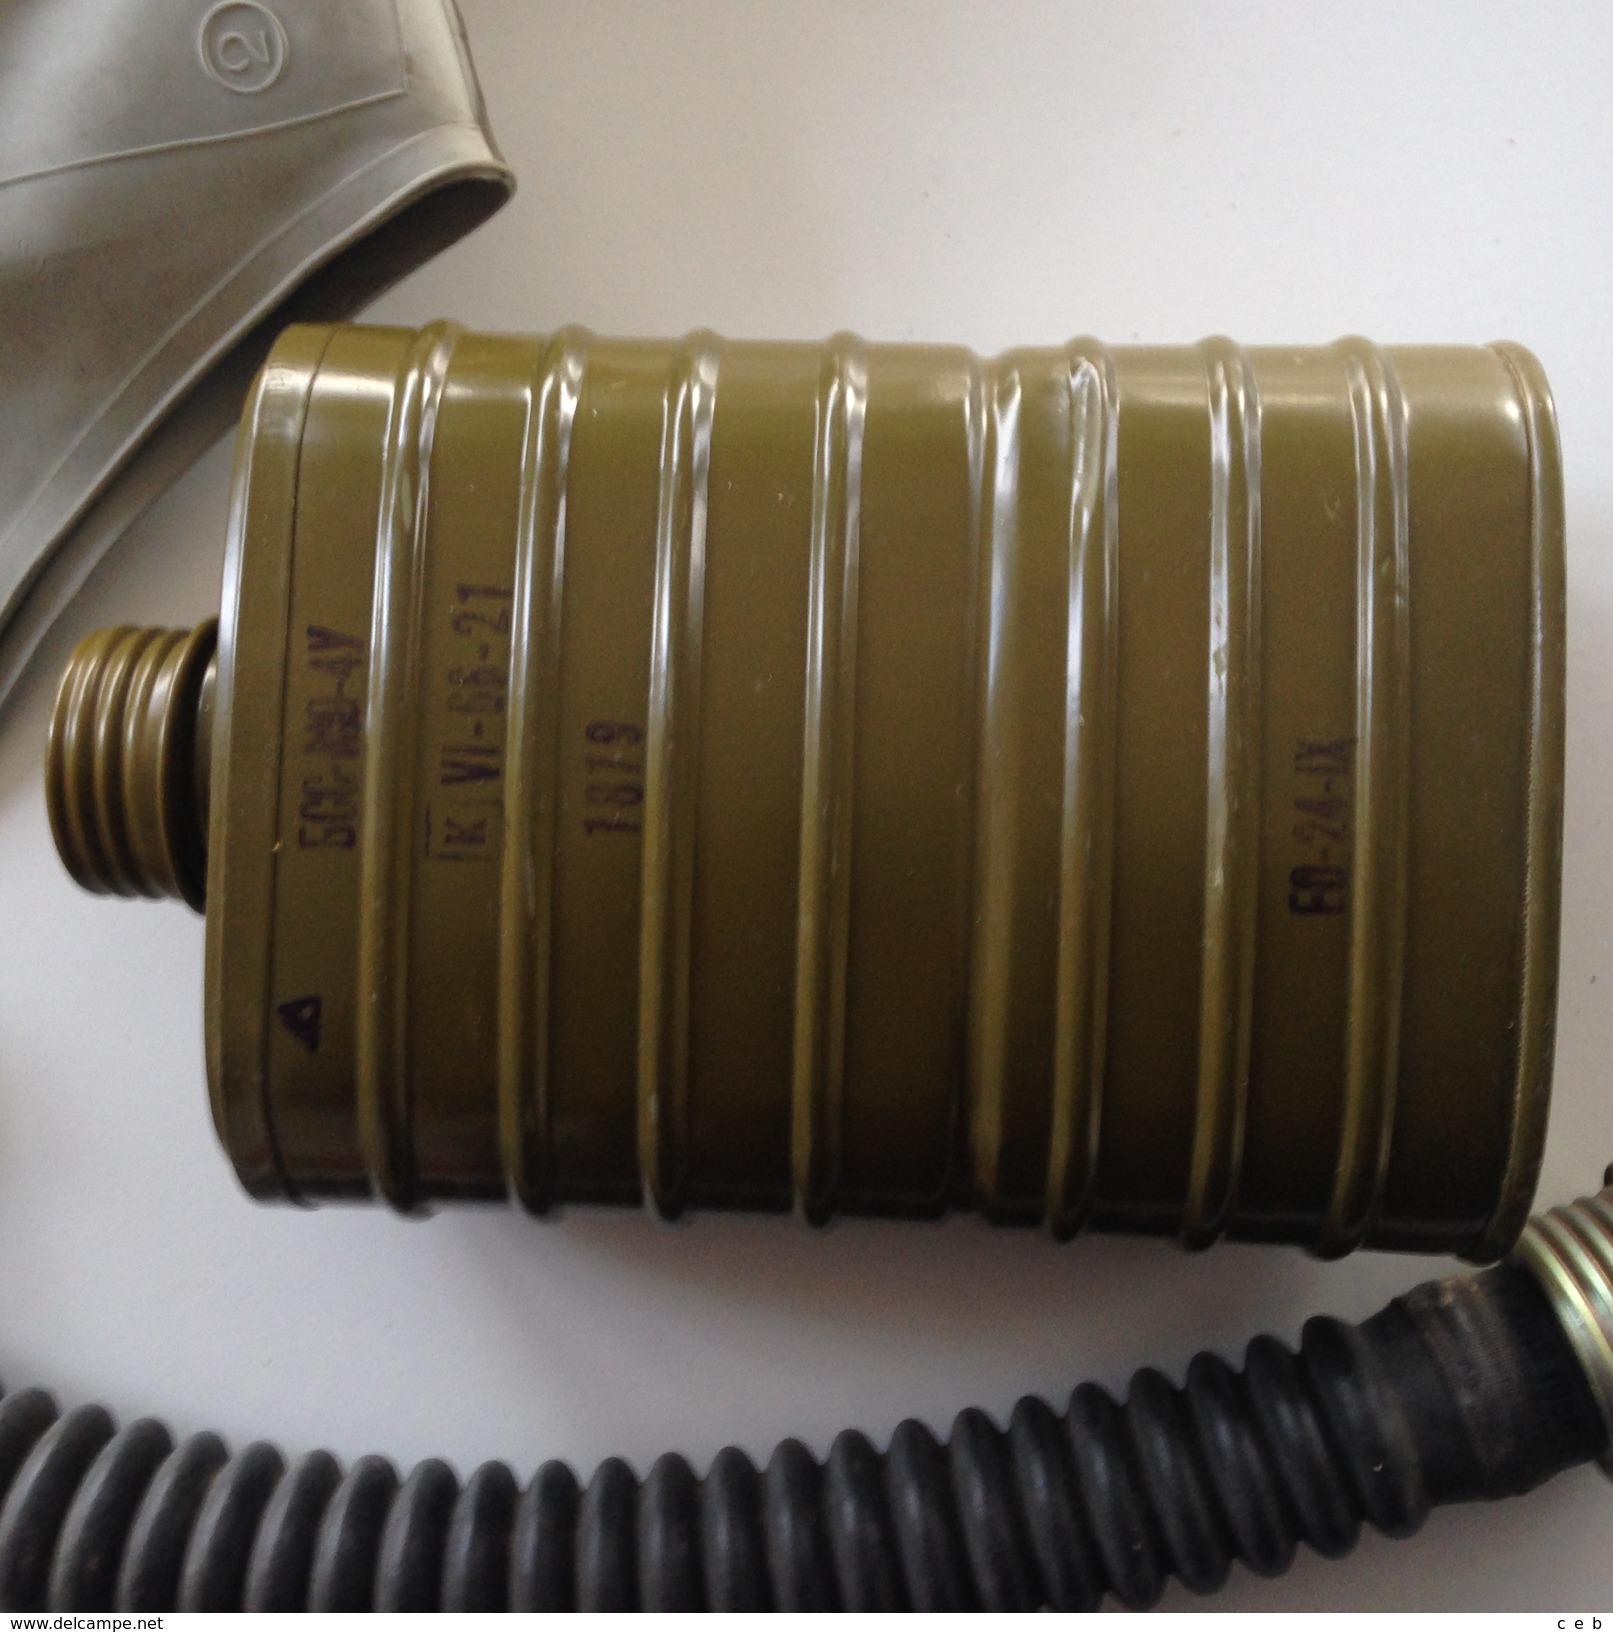 Mascara BSS-MO-4U AntiGas Búlgara. Soviética. Comunista. Guerra Fría. Años ´70. Ejército Búlgaro - Equipement